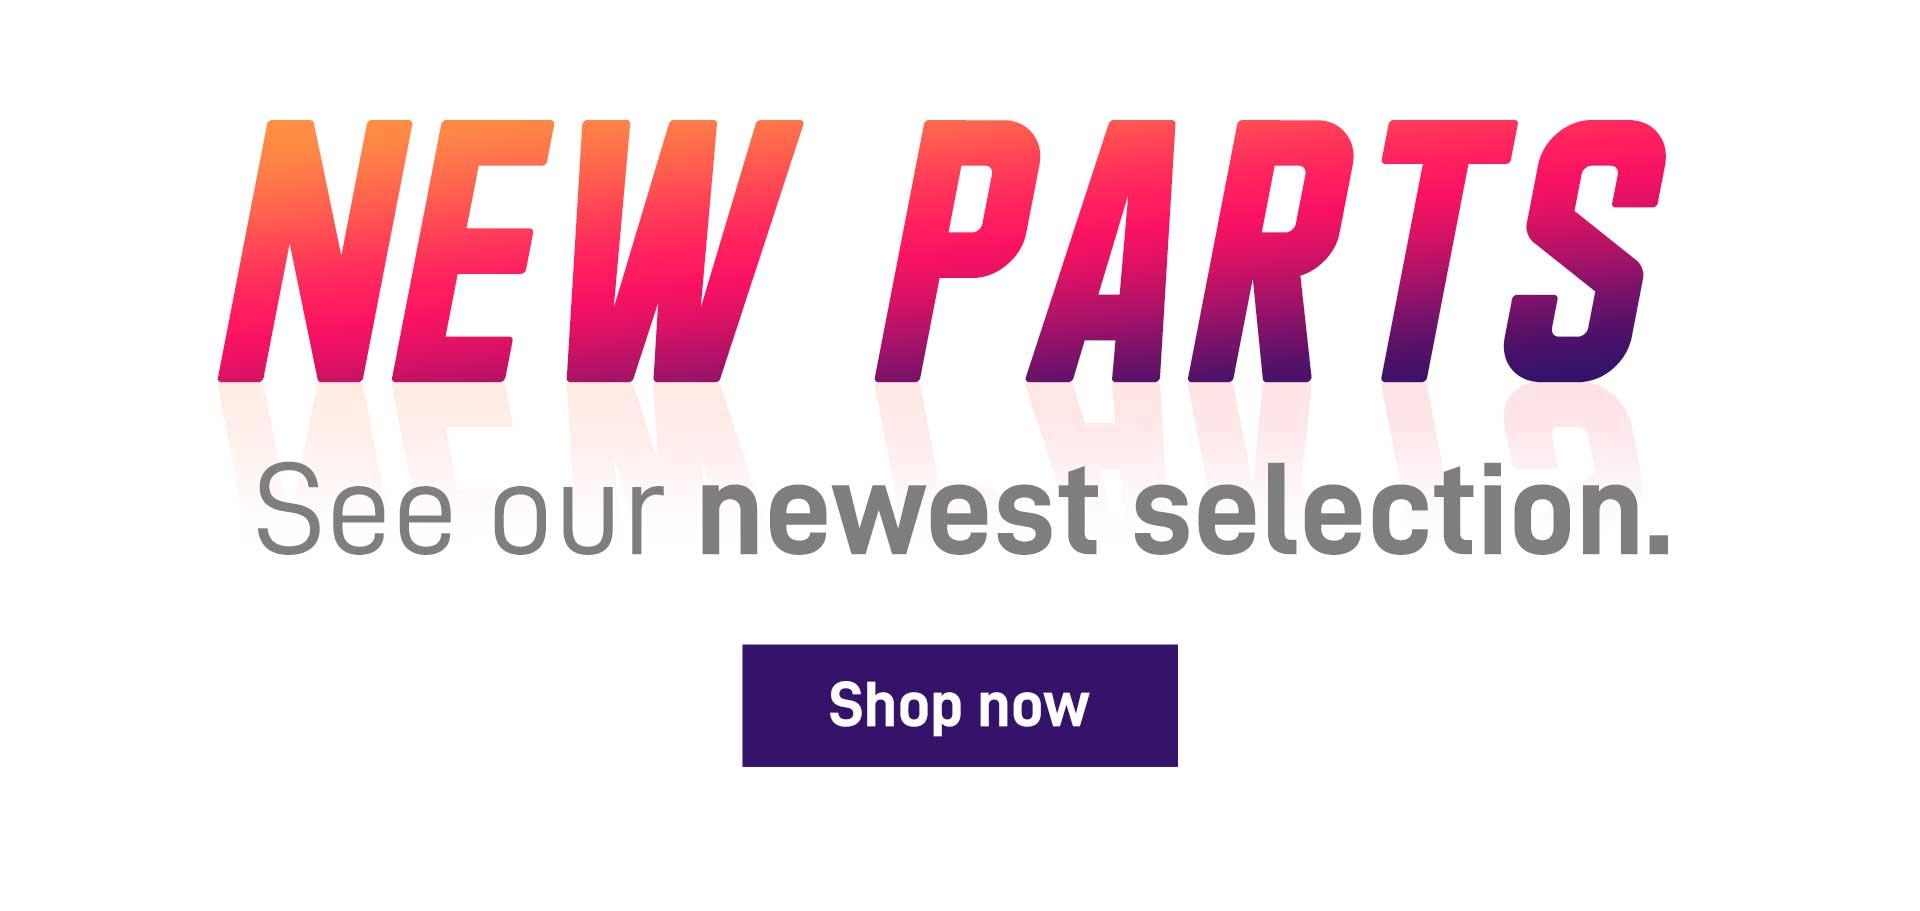 billet-proof-website-ad-new-arrivals-2.jpg